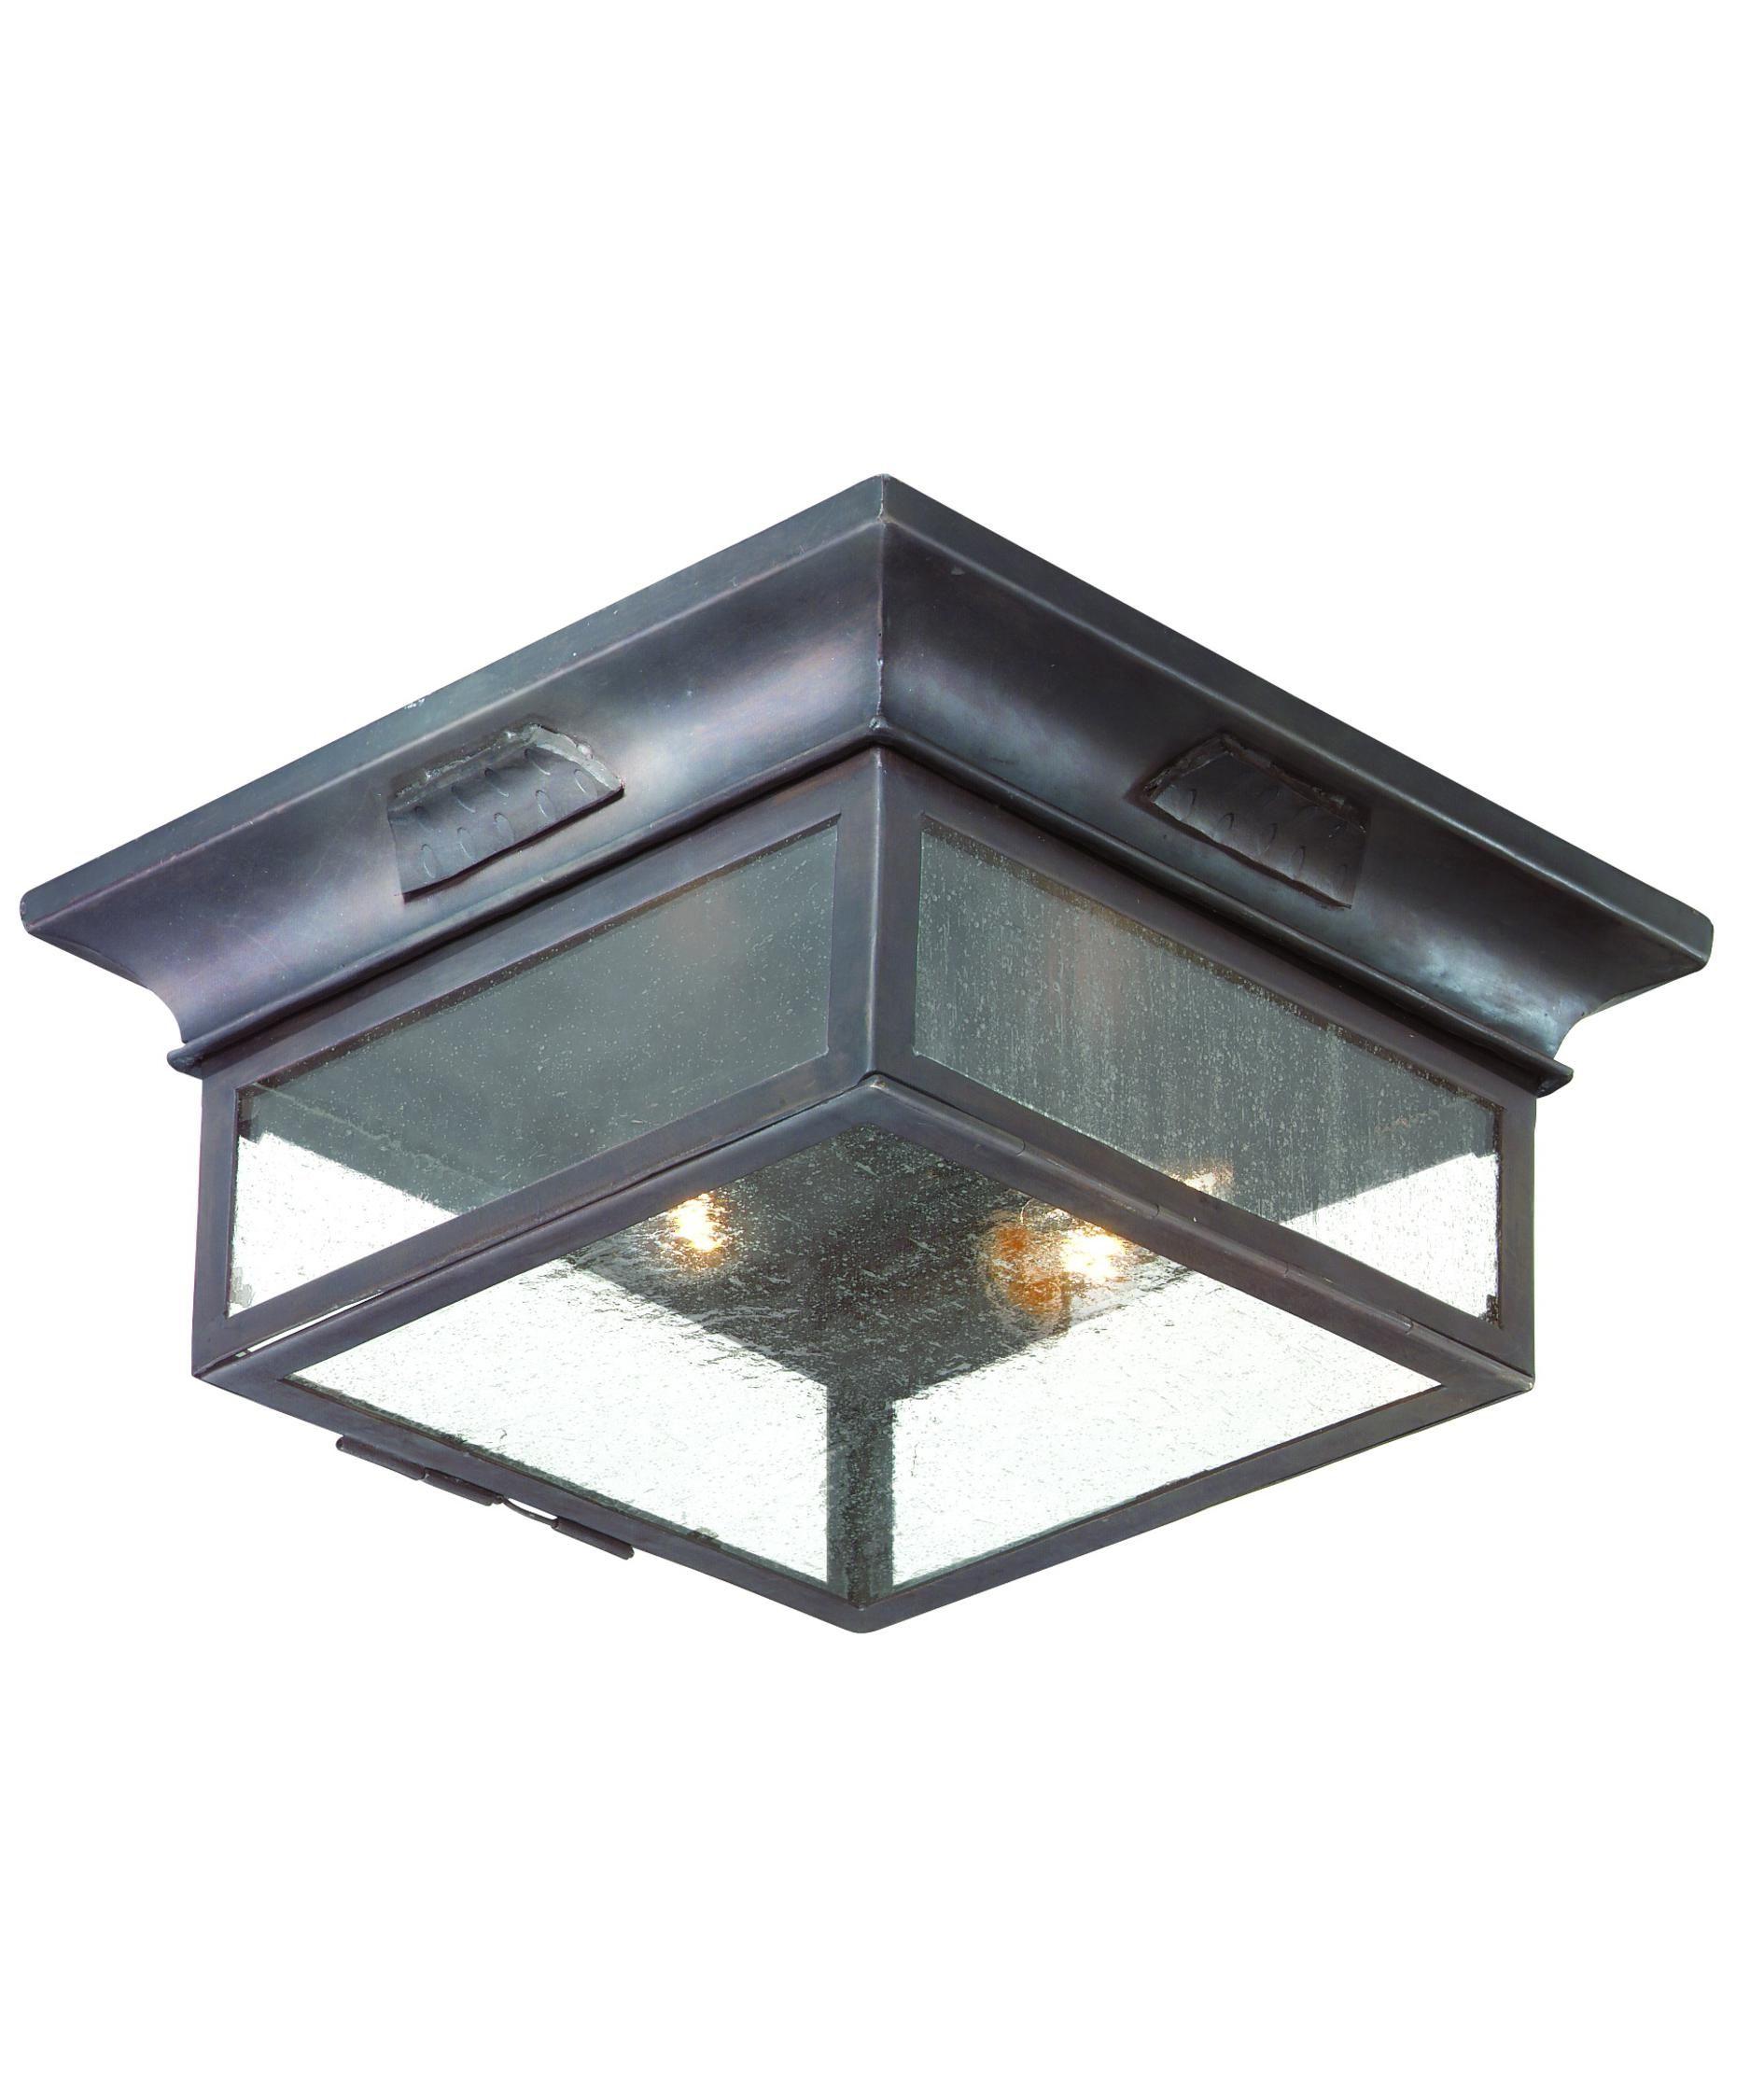 Outdoor Flush Mount Ceiling Light Fixtures